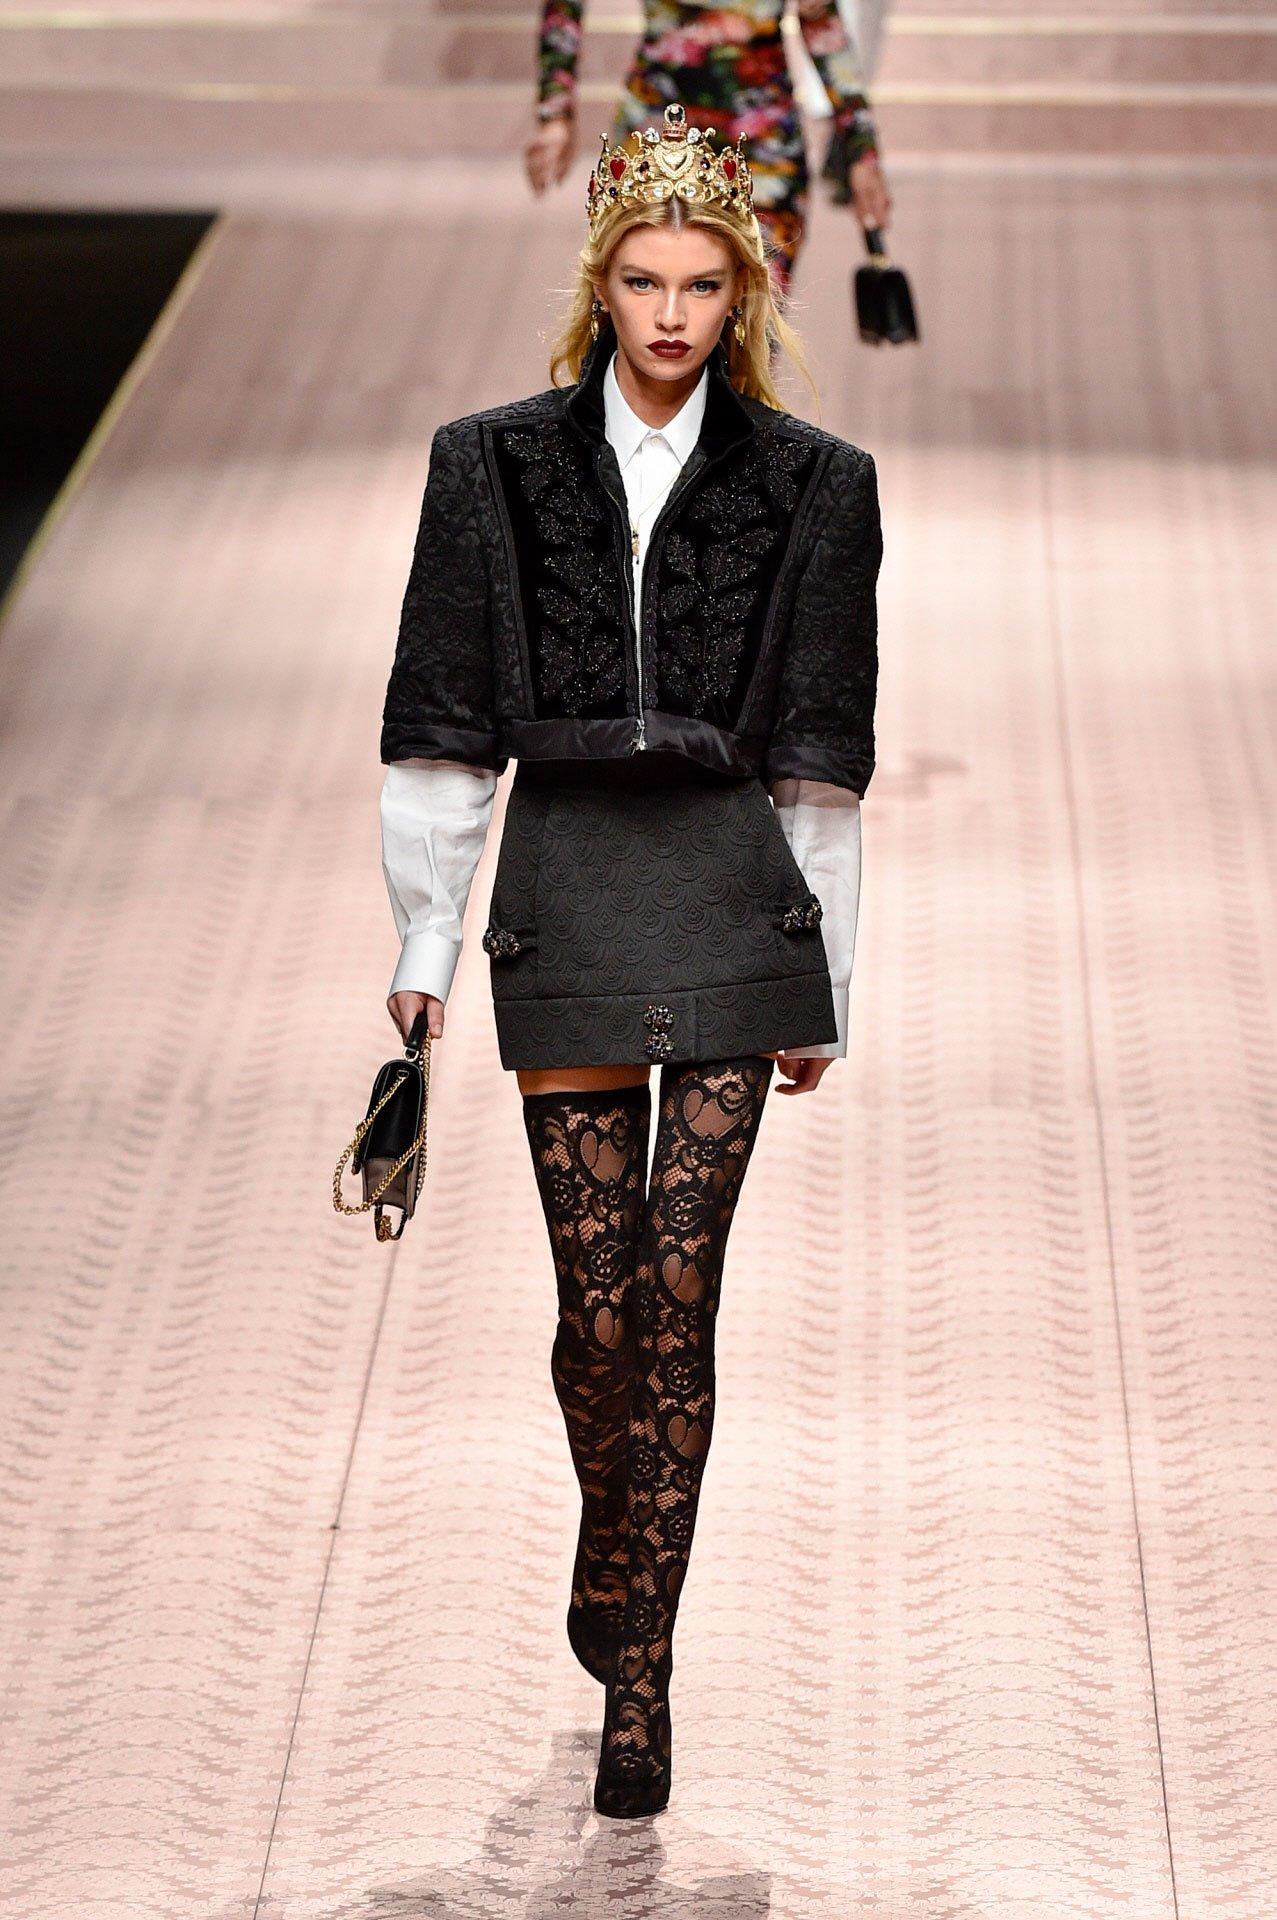 b74a3d1c3c 7 / 10. Stella Maxwell. La modelo conocida por ser un ángel de Victoria's  Secret desfiló para Dolce & Gabbana ...